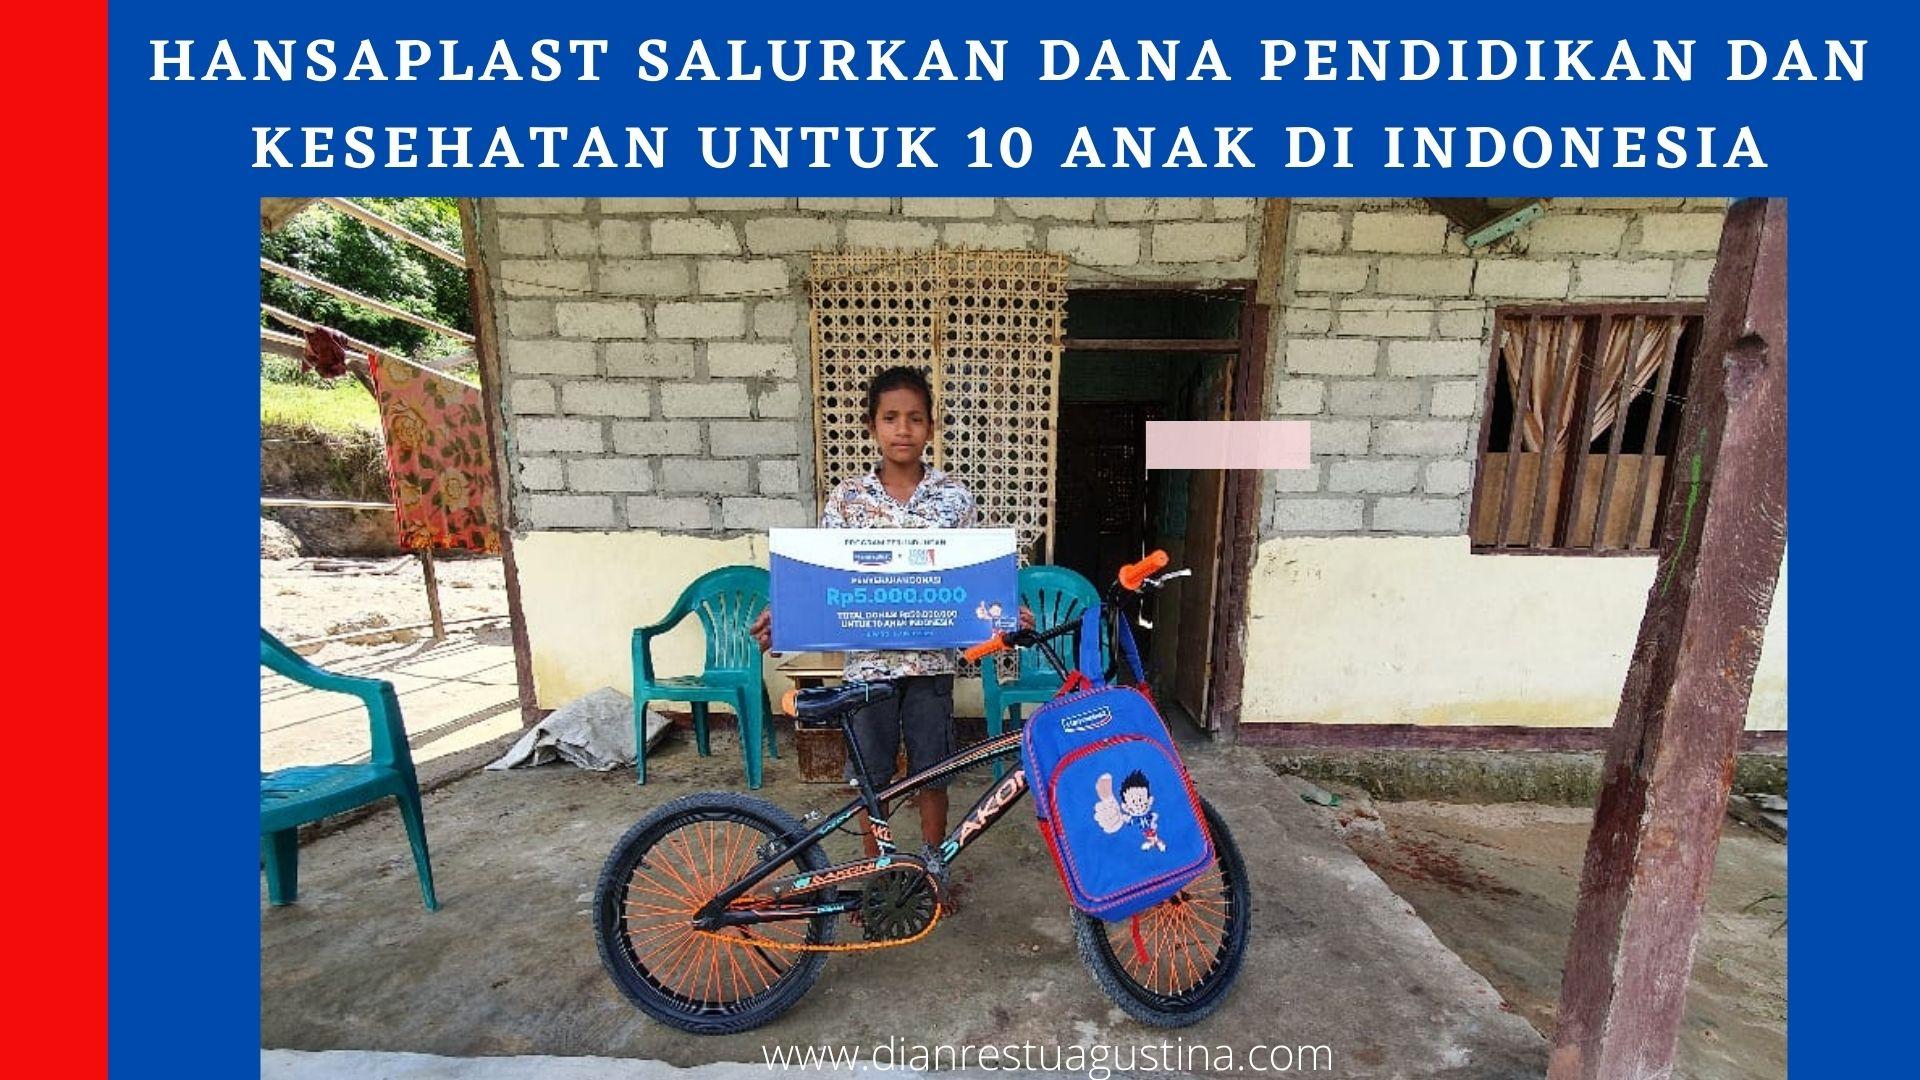 Hansaplast Plester Bacteria Shield, Hansaplast menyalurkan dana bantuan untuk 10 Anak di Indonesia melalui 1000 Guru Foundation